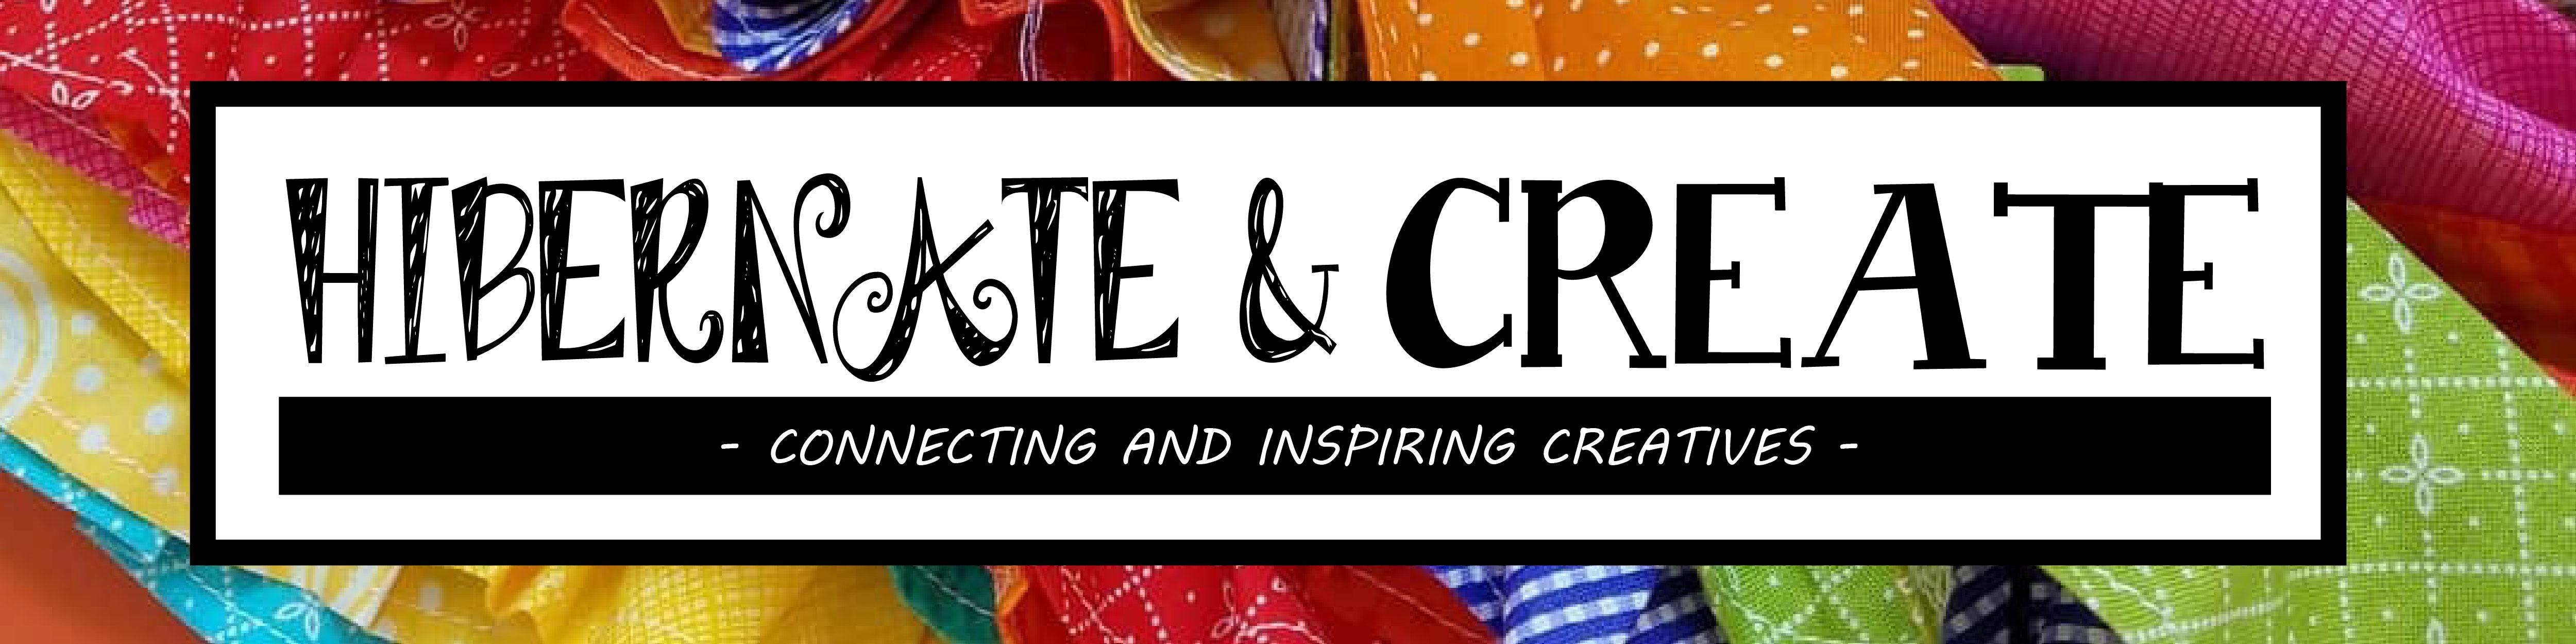 Hibernate and Create